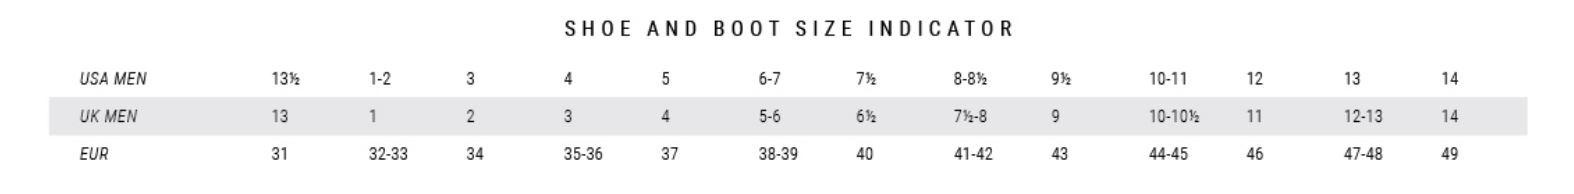 mystic-boot-size-chart.jpg